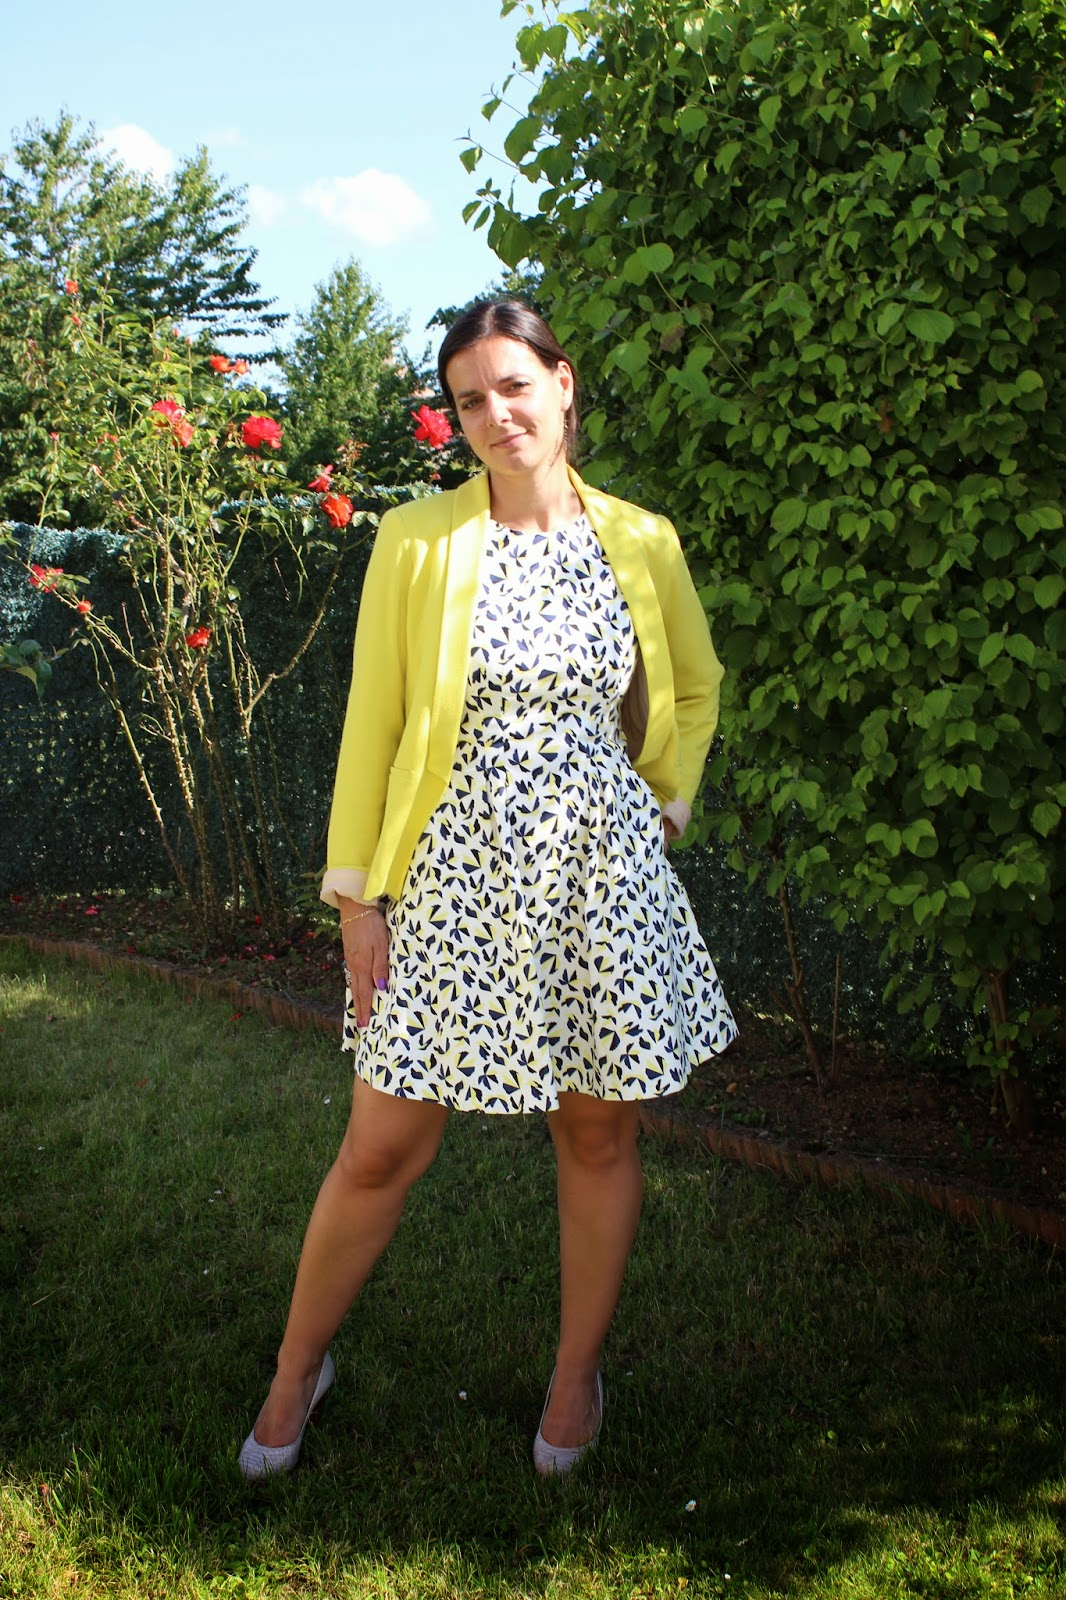 robe zara à motif jaune et veste jaune promod